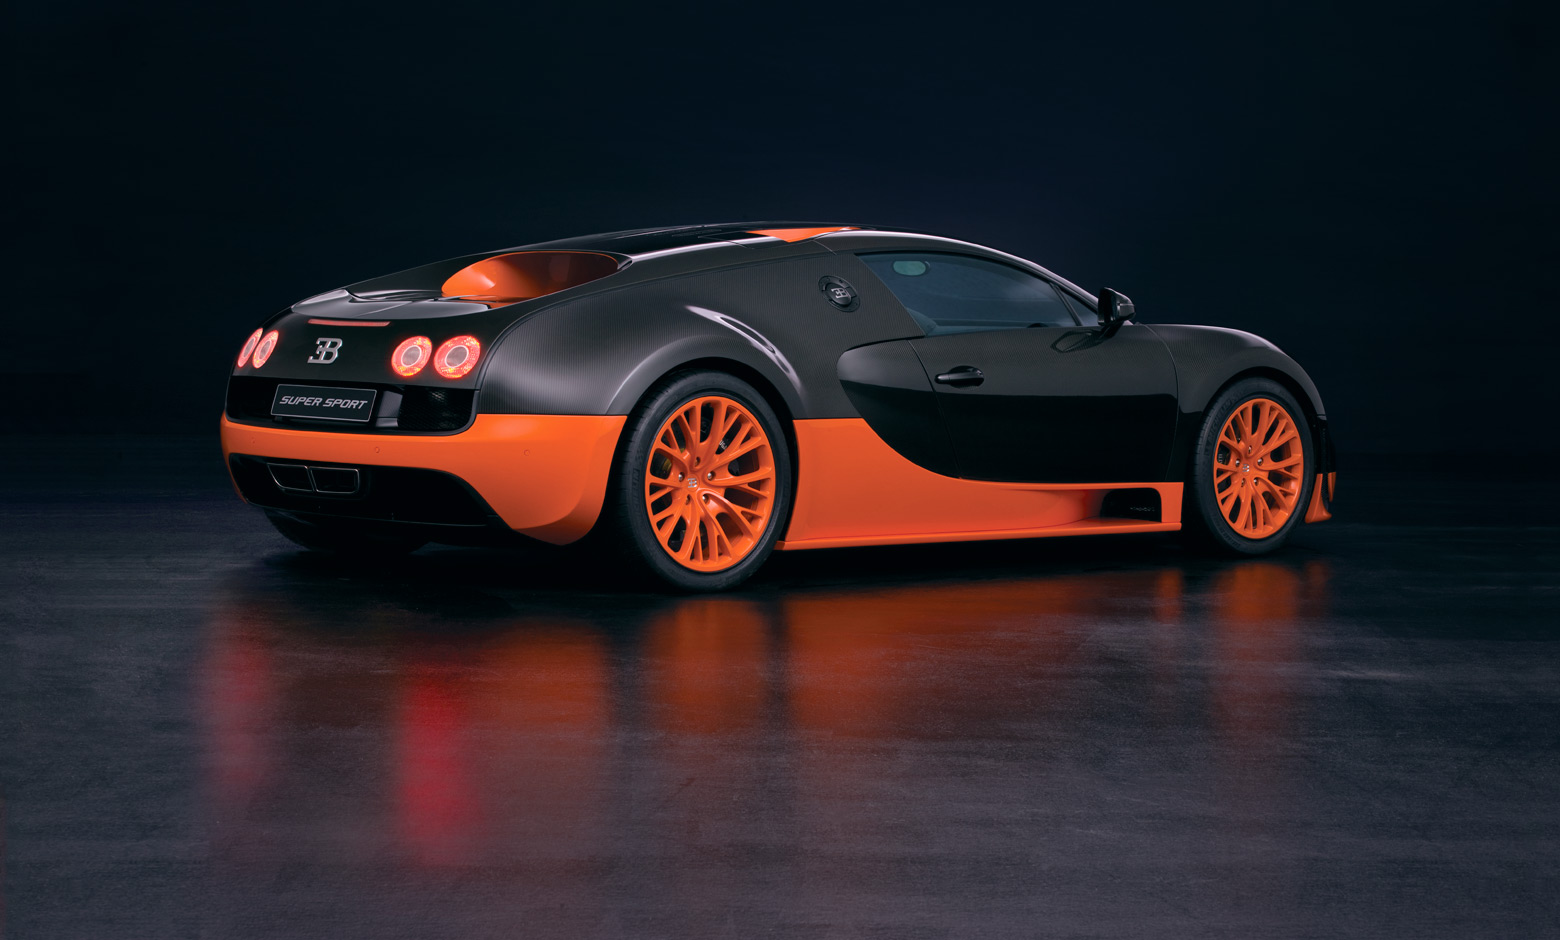 HD Quality Wallpaper | Collection: Vehicles, 1560x940 Bugatti Veyron